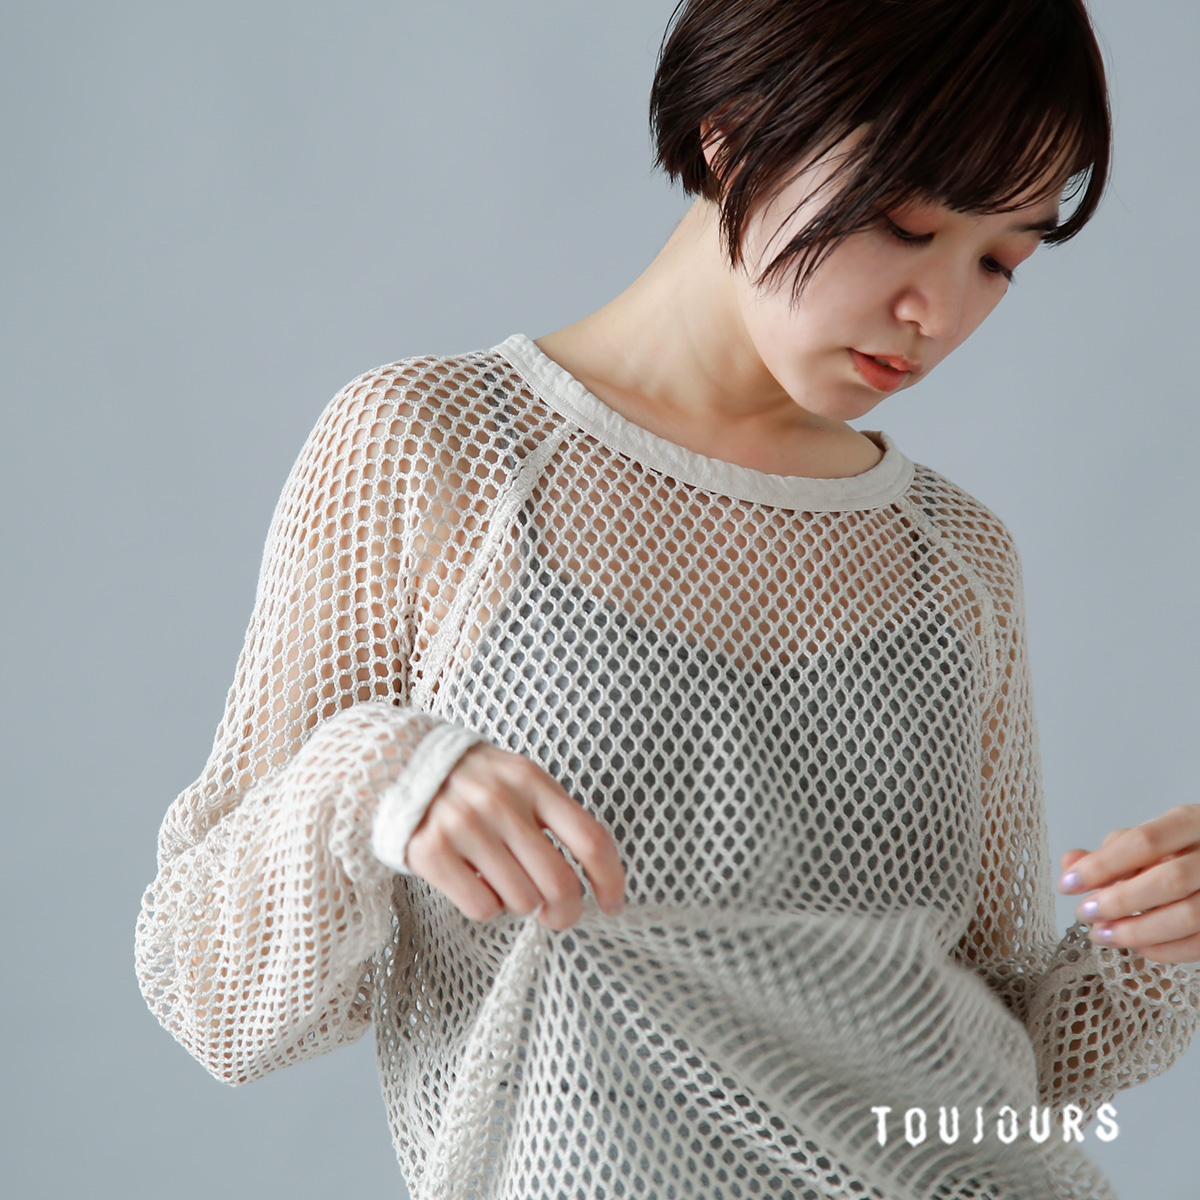 "TOUJOURS(トゥジュー)ジャージー長袖Tシャツ""Authentic Cotton Fishnet Jersey Long Sleeve T-shirt"" lm34xc03"